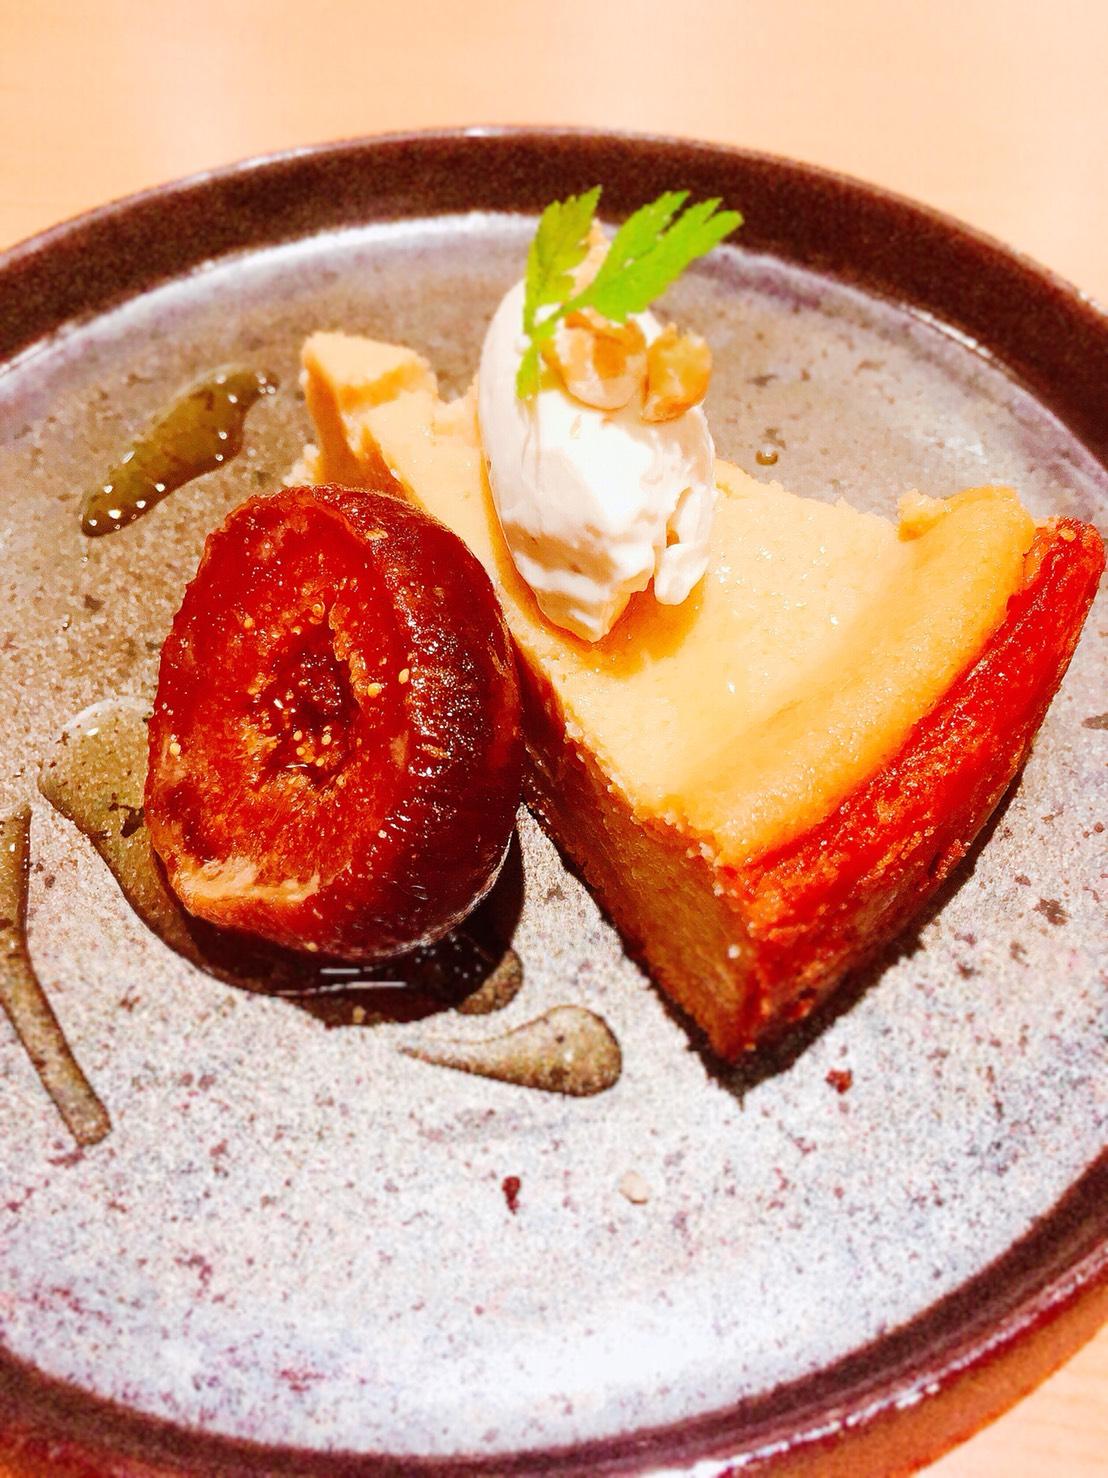 ORI TOKYOカフェ【本日のお菓子】濃厚ベイクドチーズケーキ 無花果の蜜煮添え